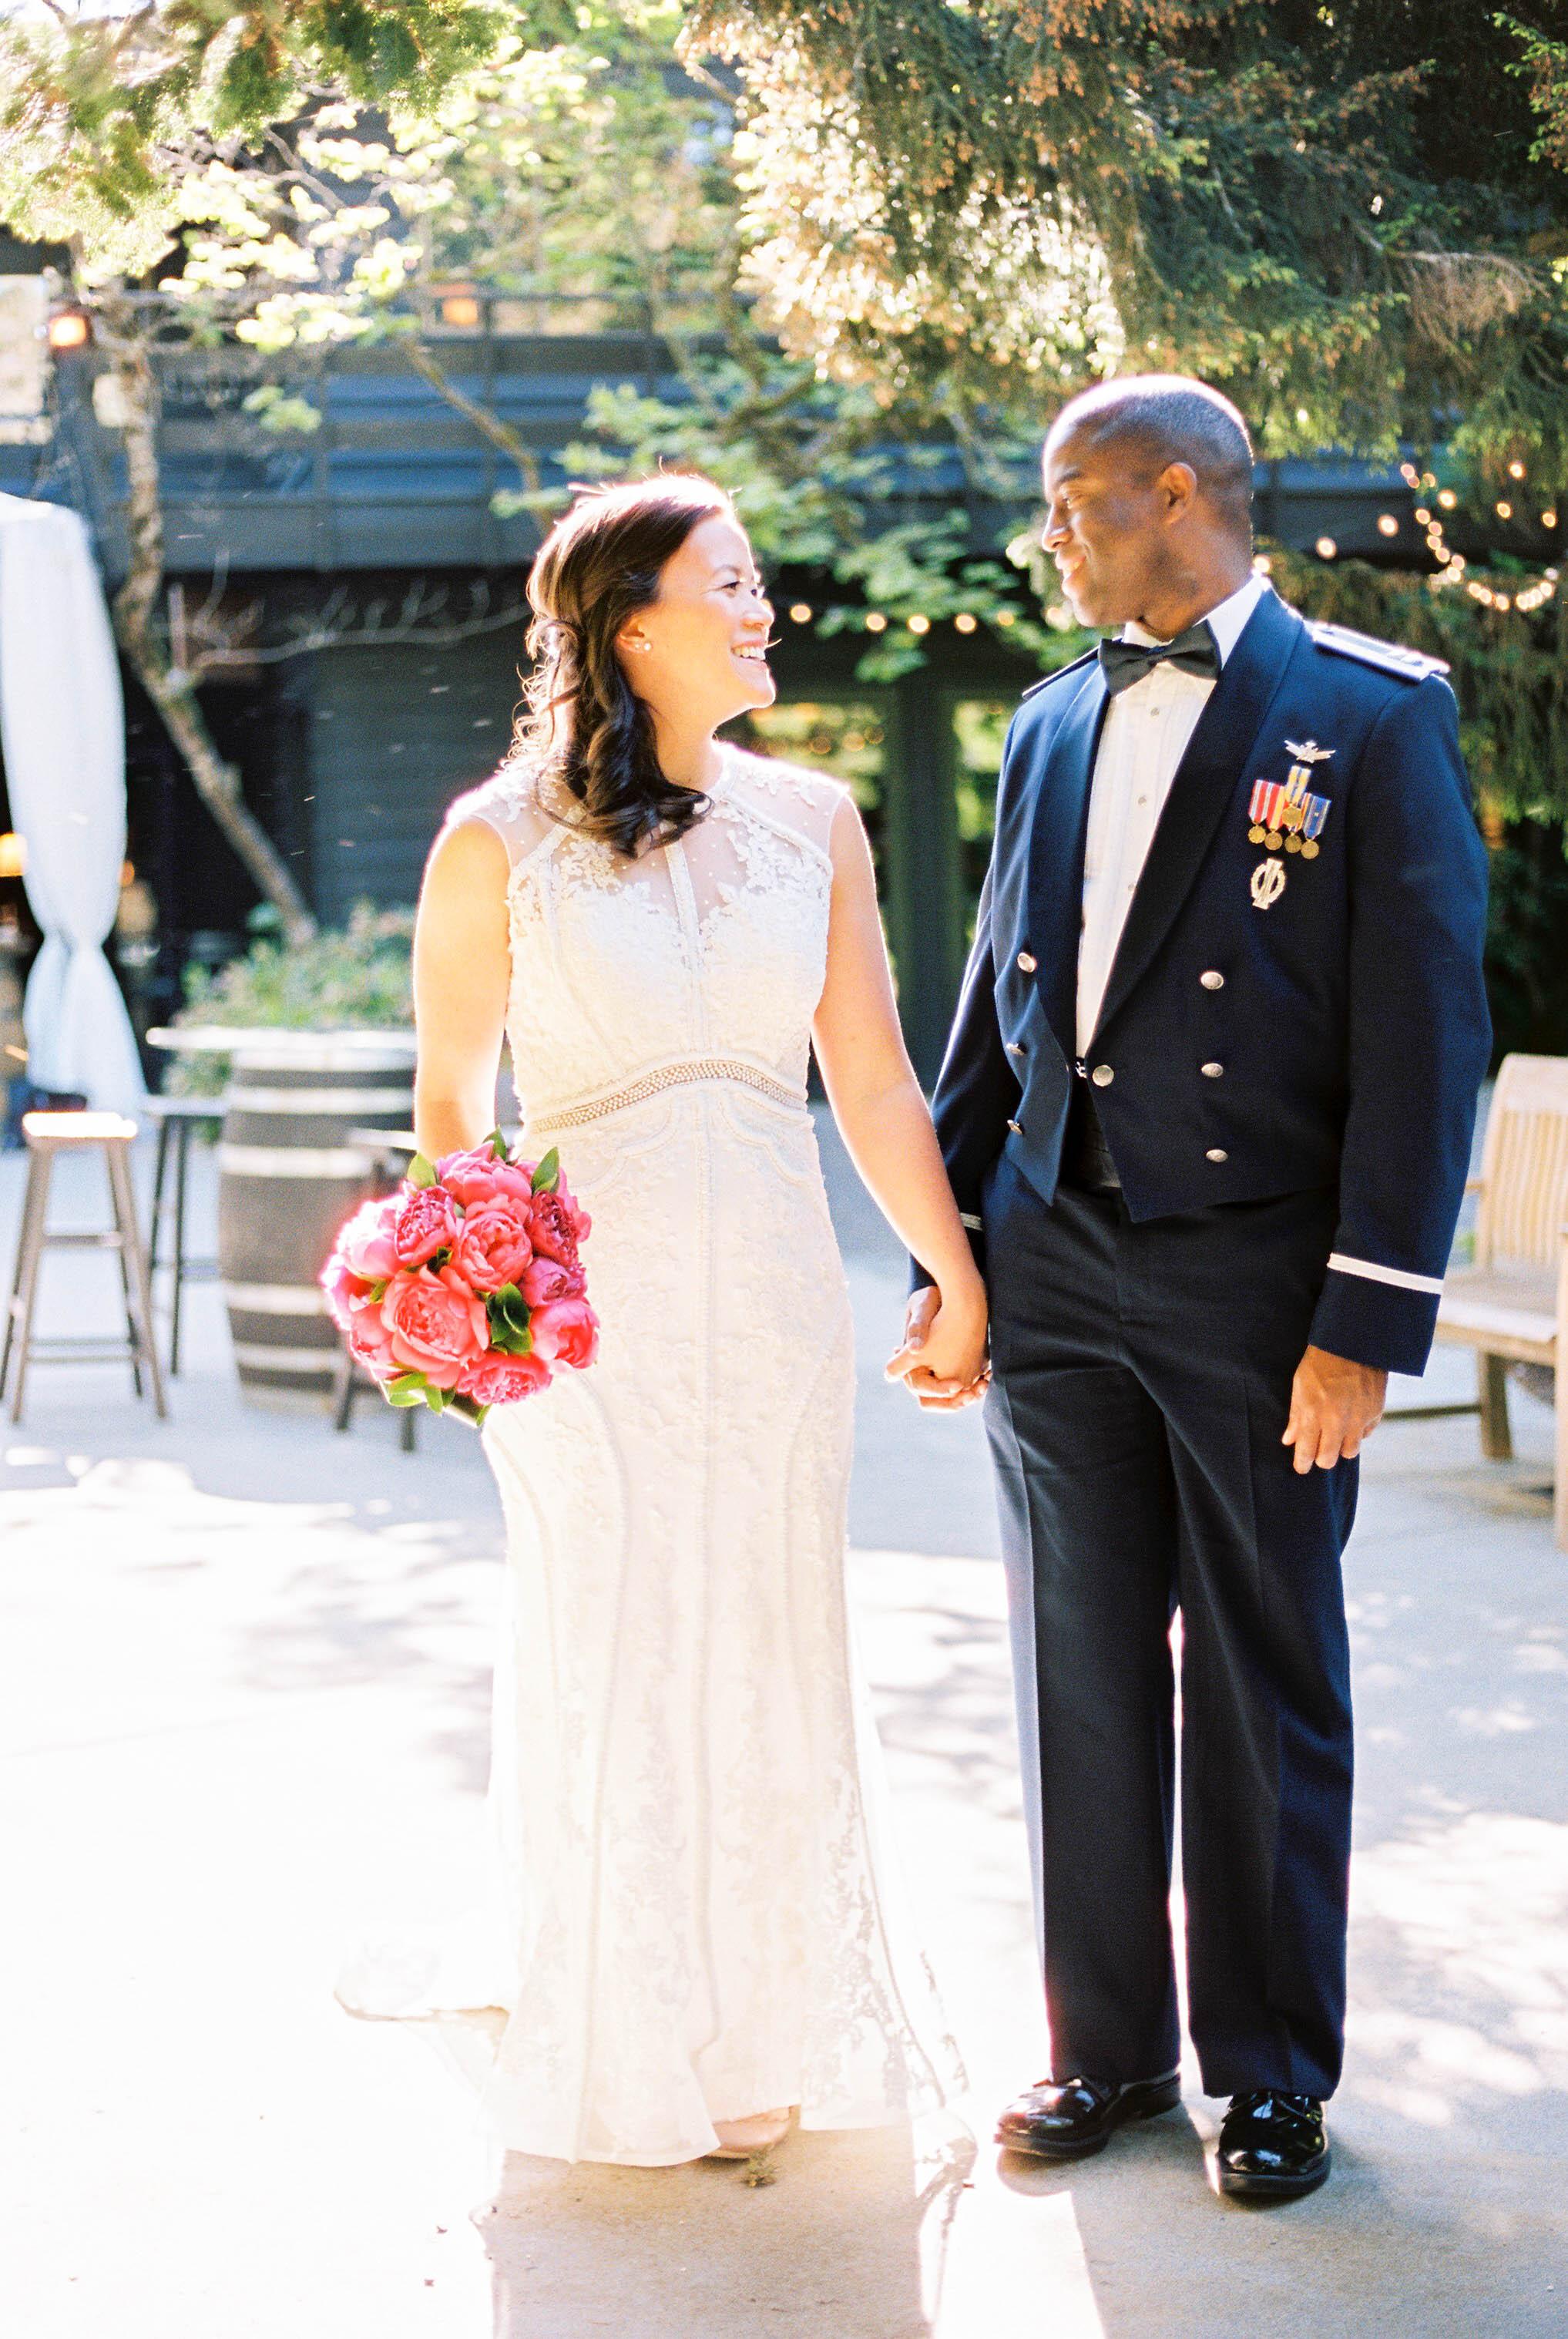 Wedding Planner Seattle   Wedding Wise   Kerry Jeanne Photography   JM Cellars Wedding   Fuschia and navy blue wedding